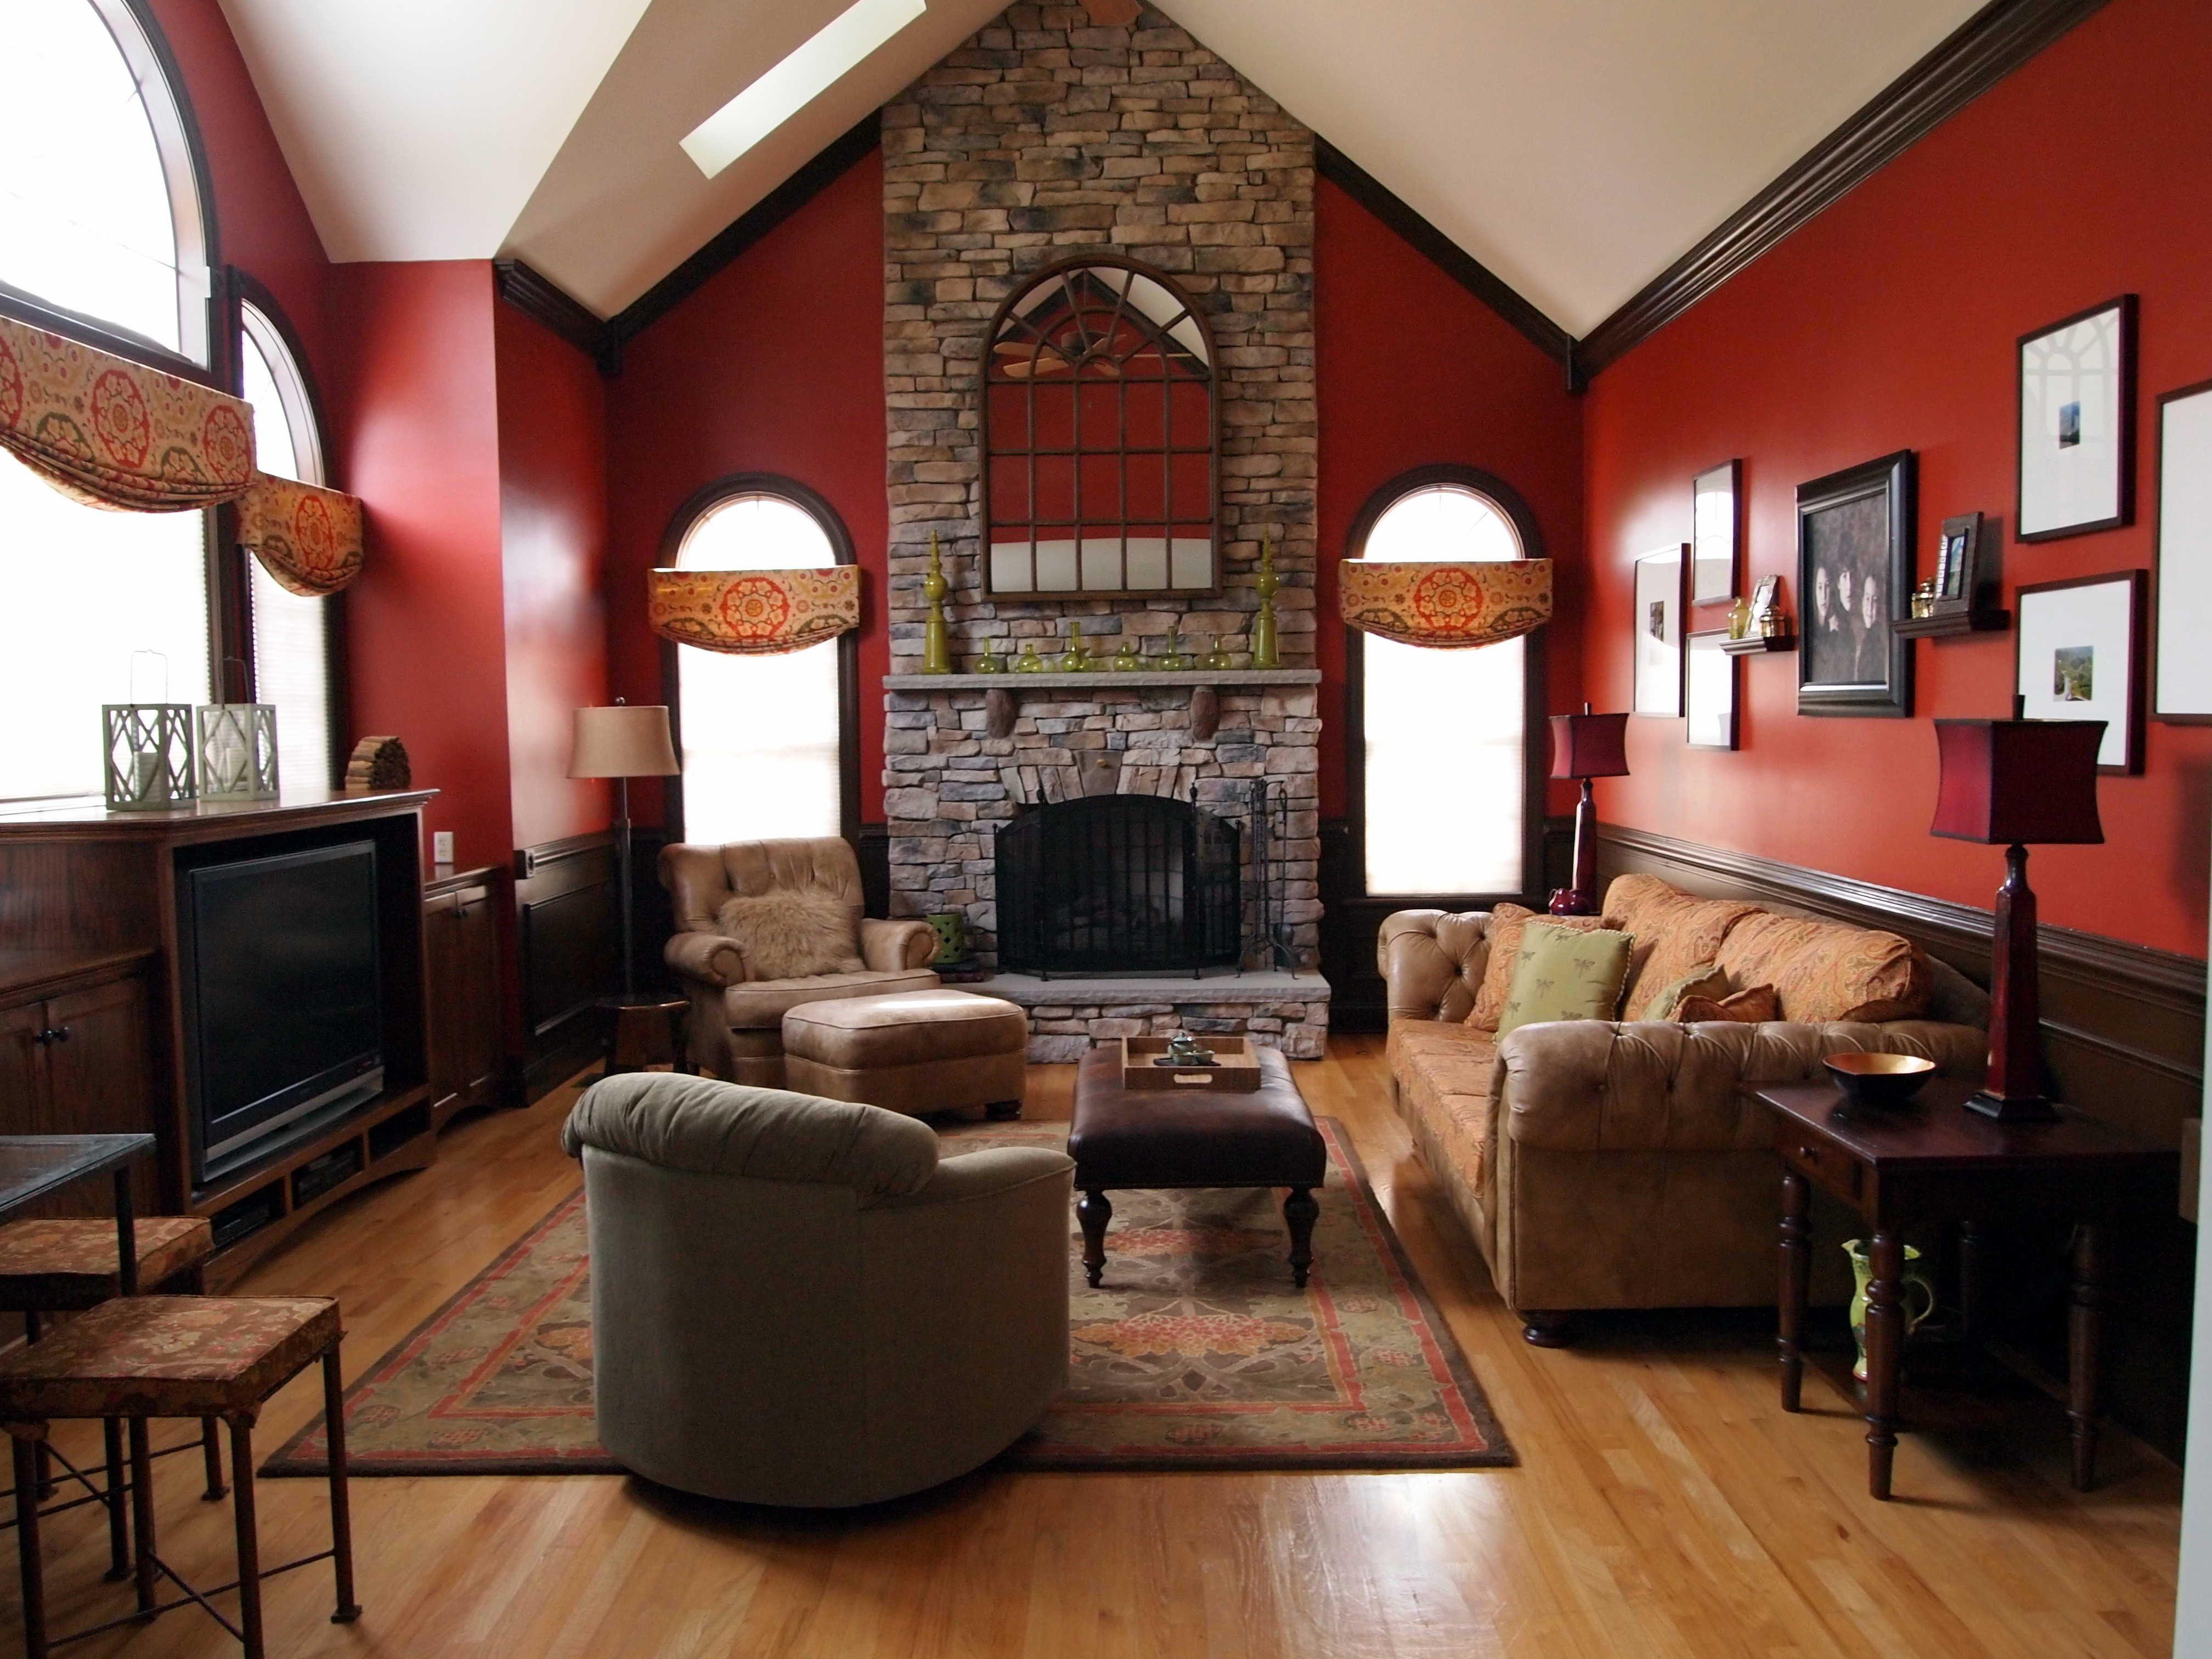 Uncategorized Rustic Family Rooms rustic living room colors httphdwallpaper inforustic room